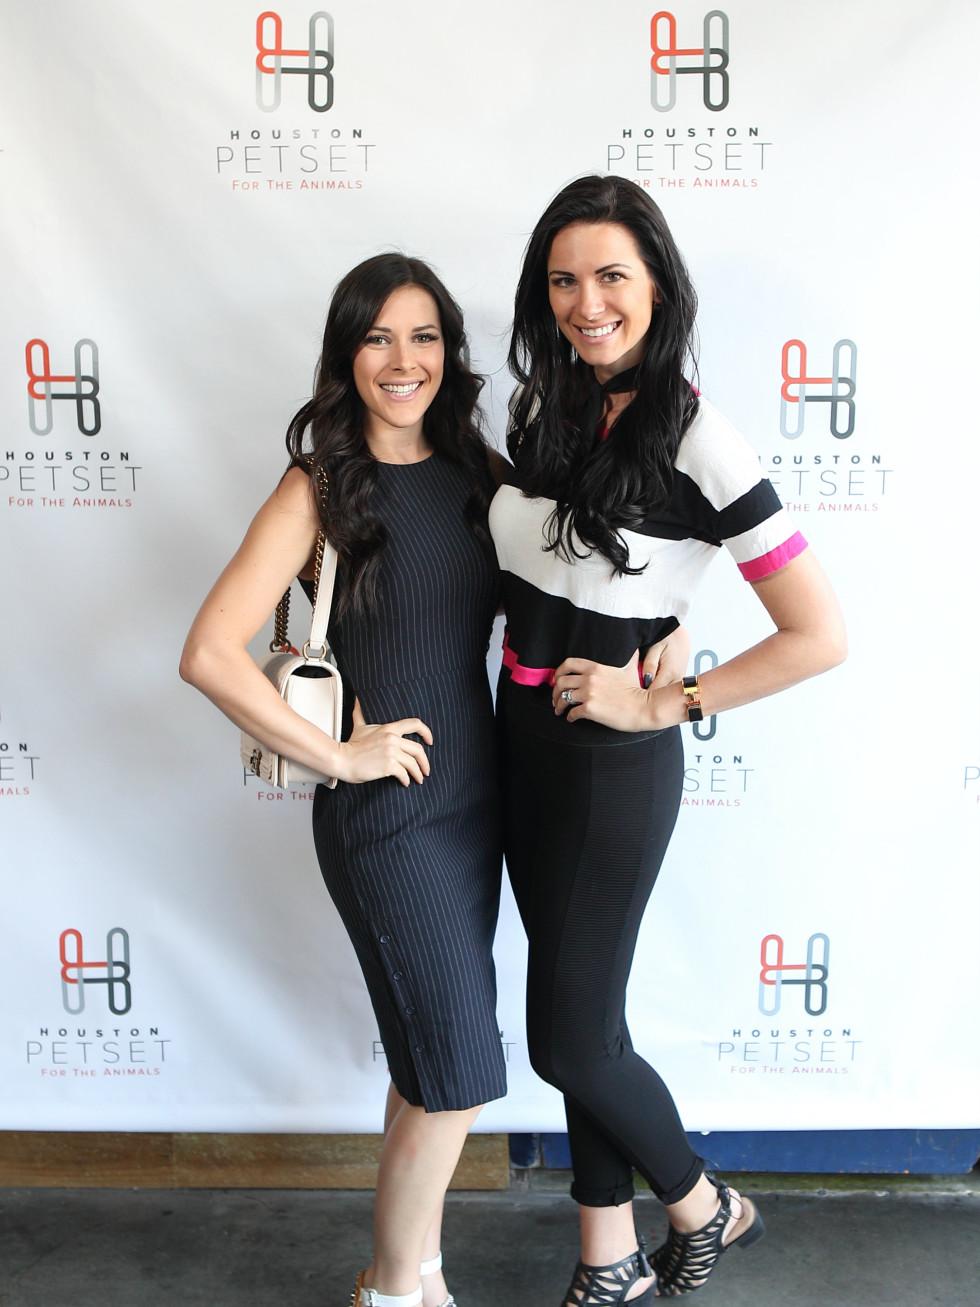 Club PetSet Young Professionals Melissa Valenzuela, Danielle Kuban